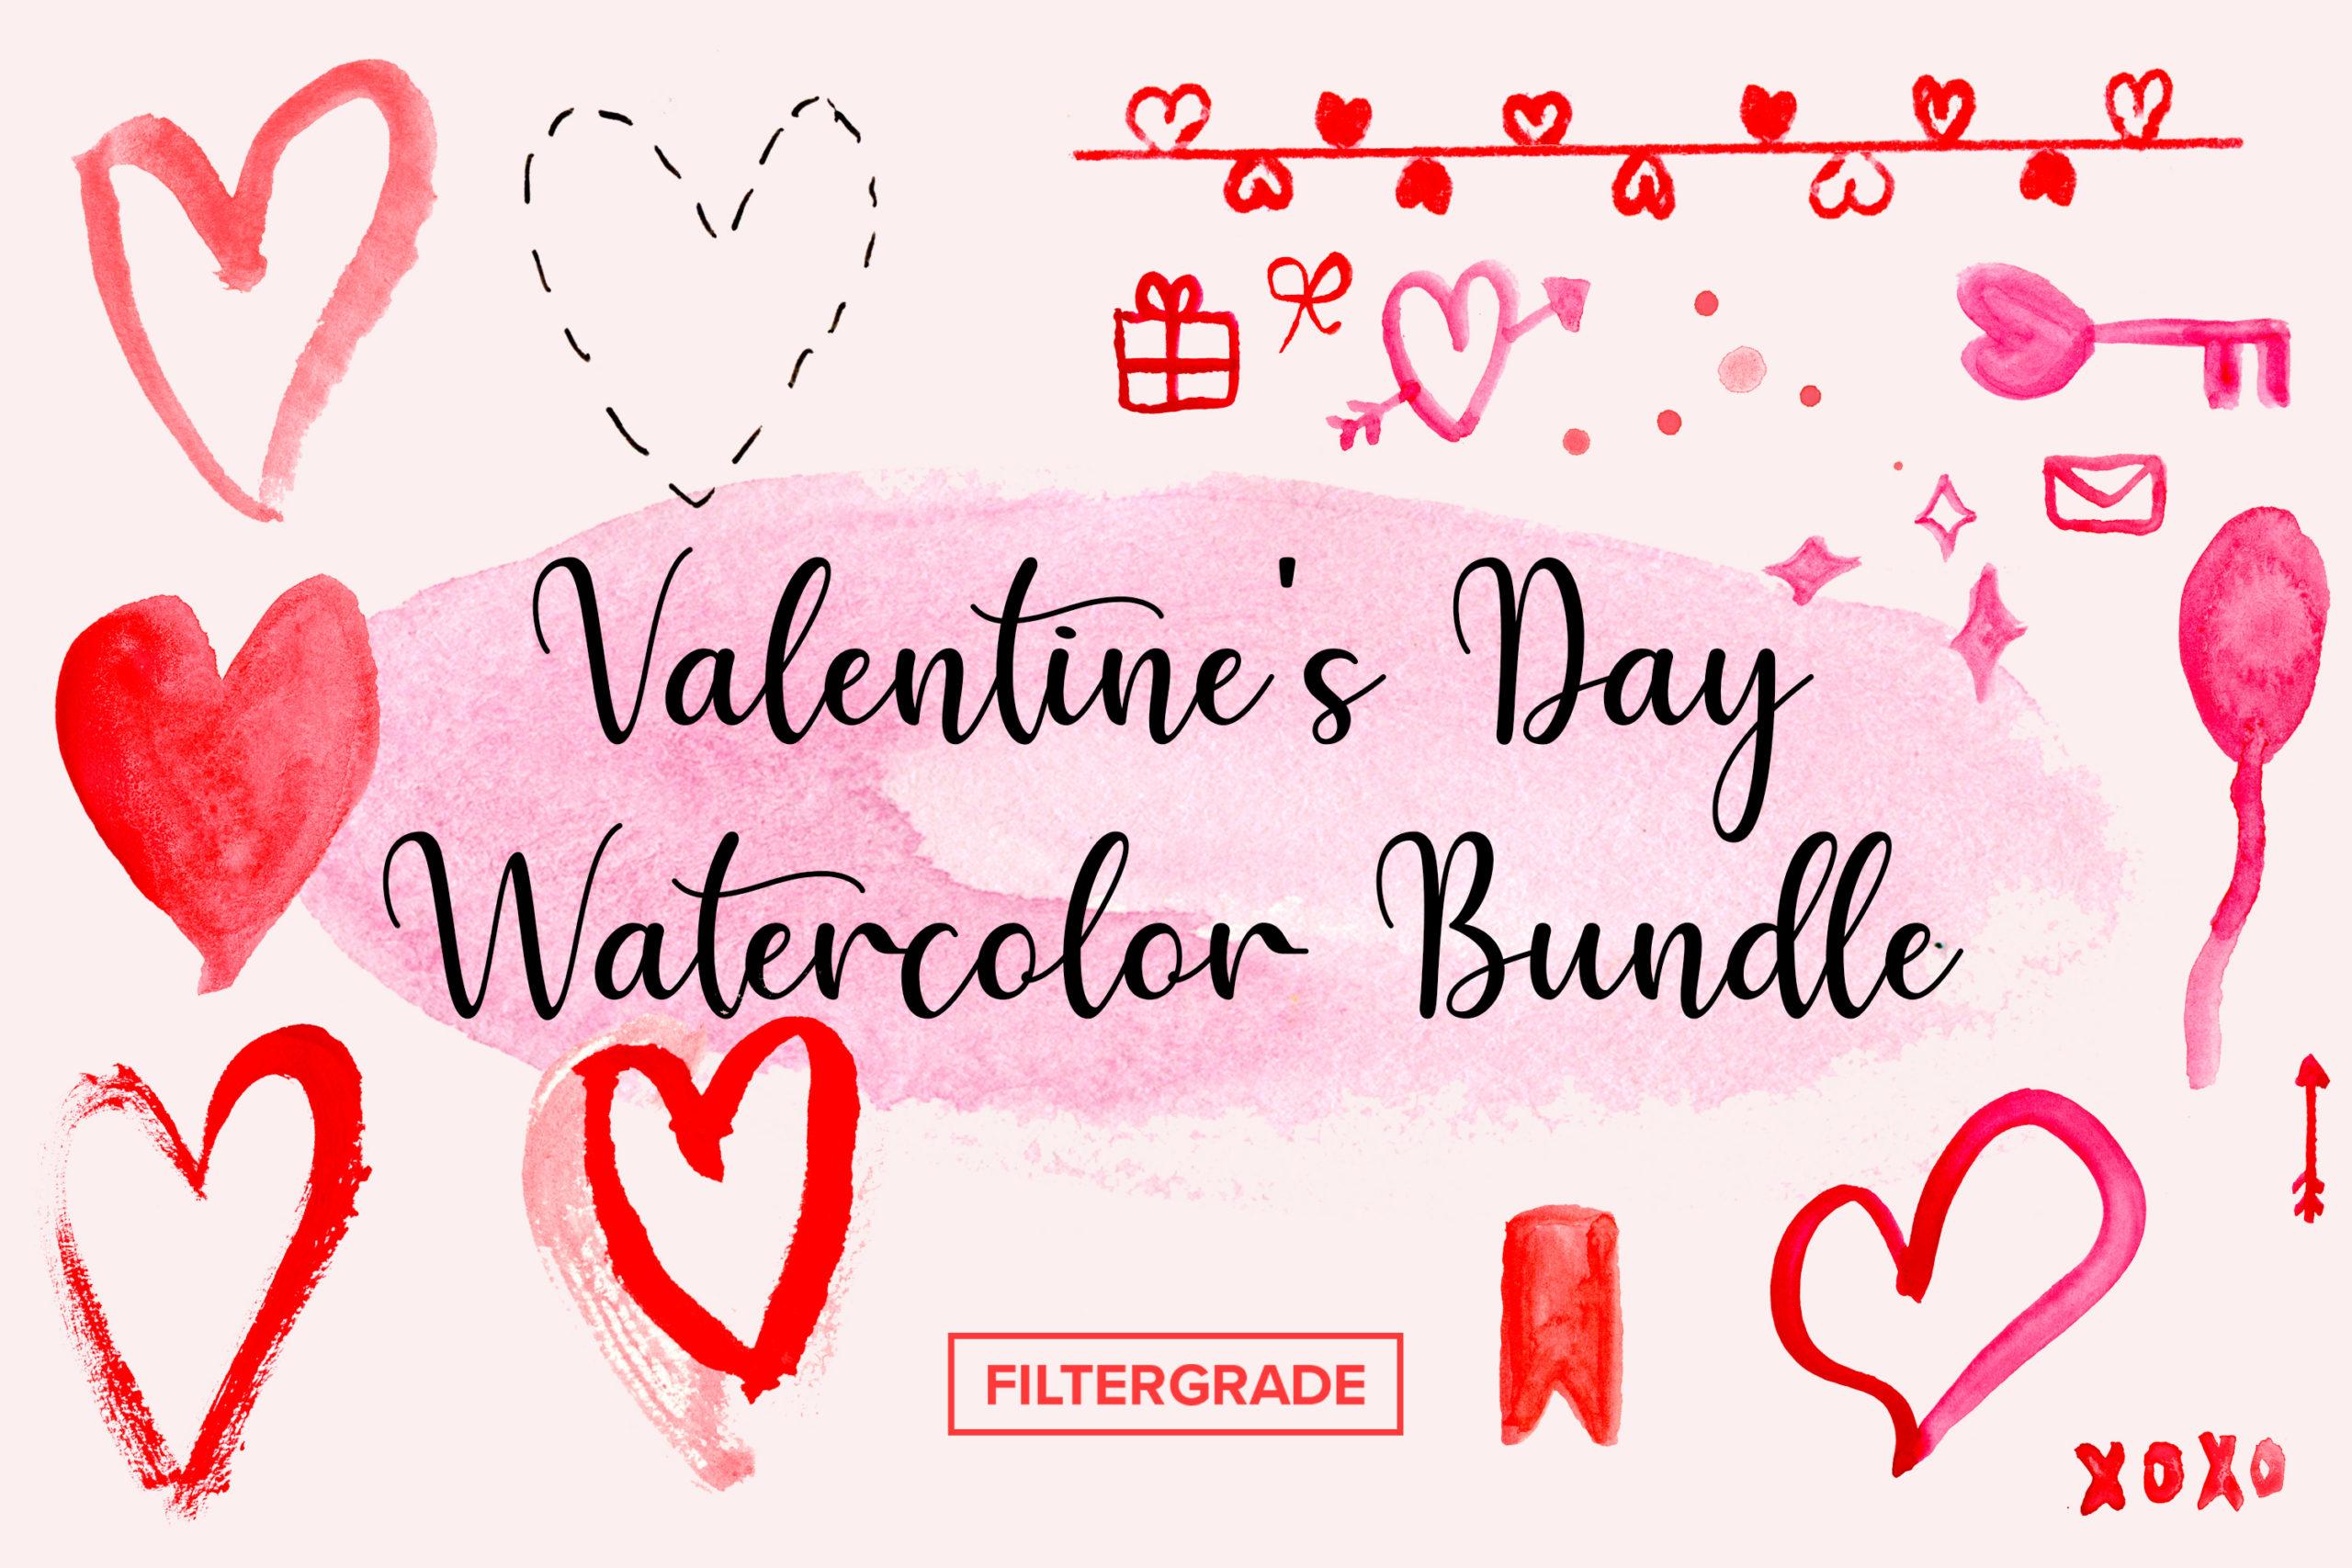 Valentine S Day Watercolor Bundle Filtergrade